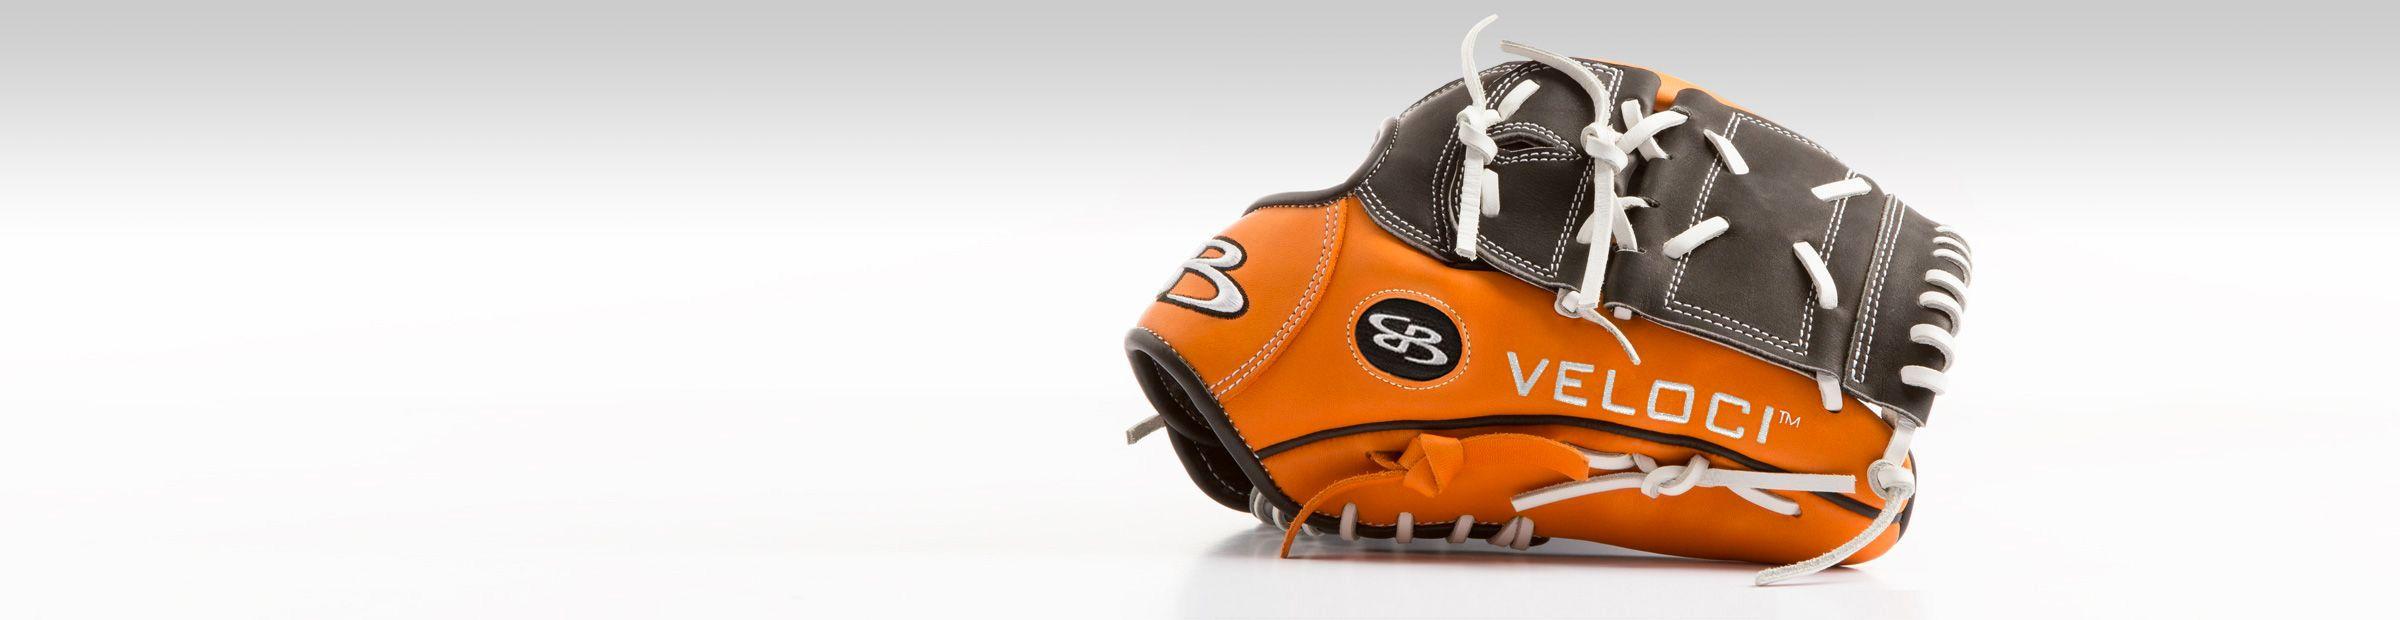 Boombah KIP Series Fielding Gloves